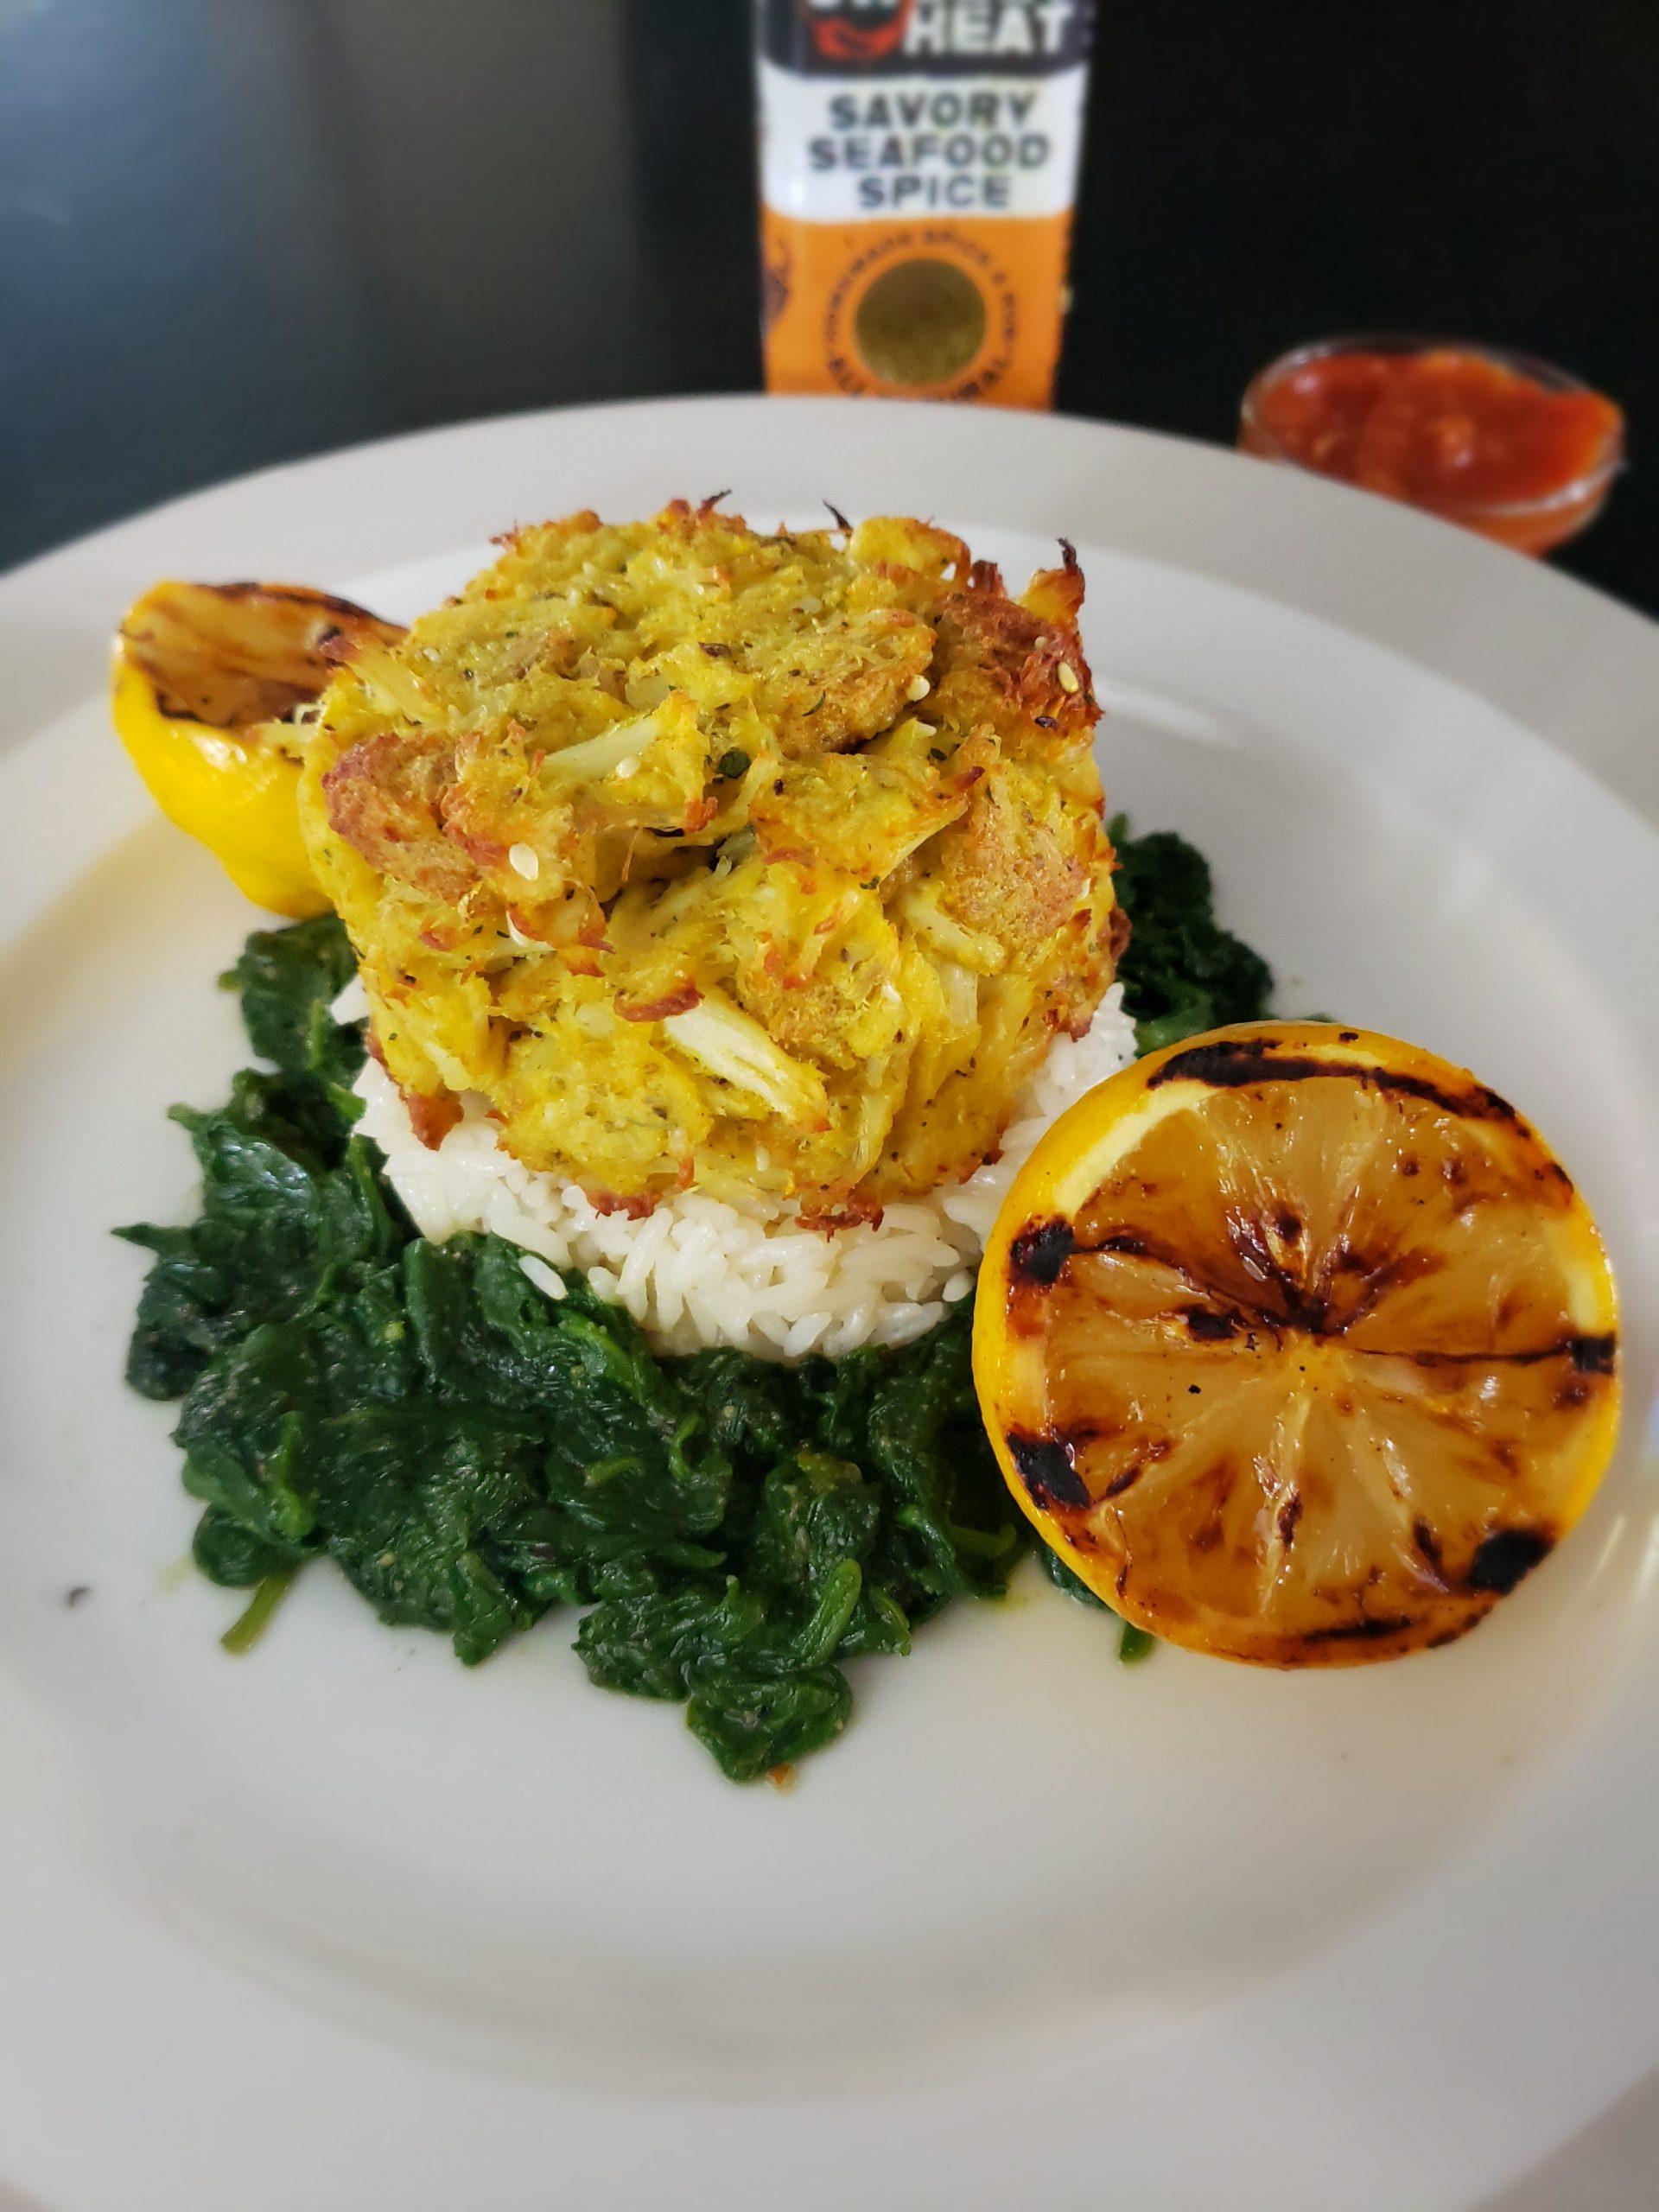 SWEEETHEAT Crab Cakes|SWEEETHEAT